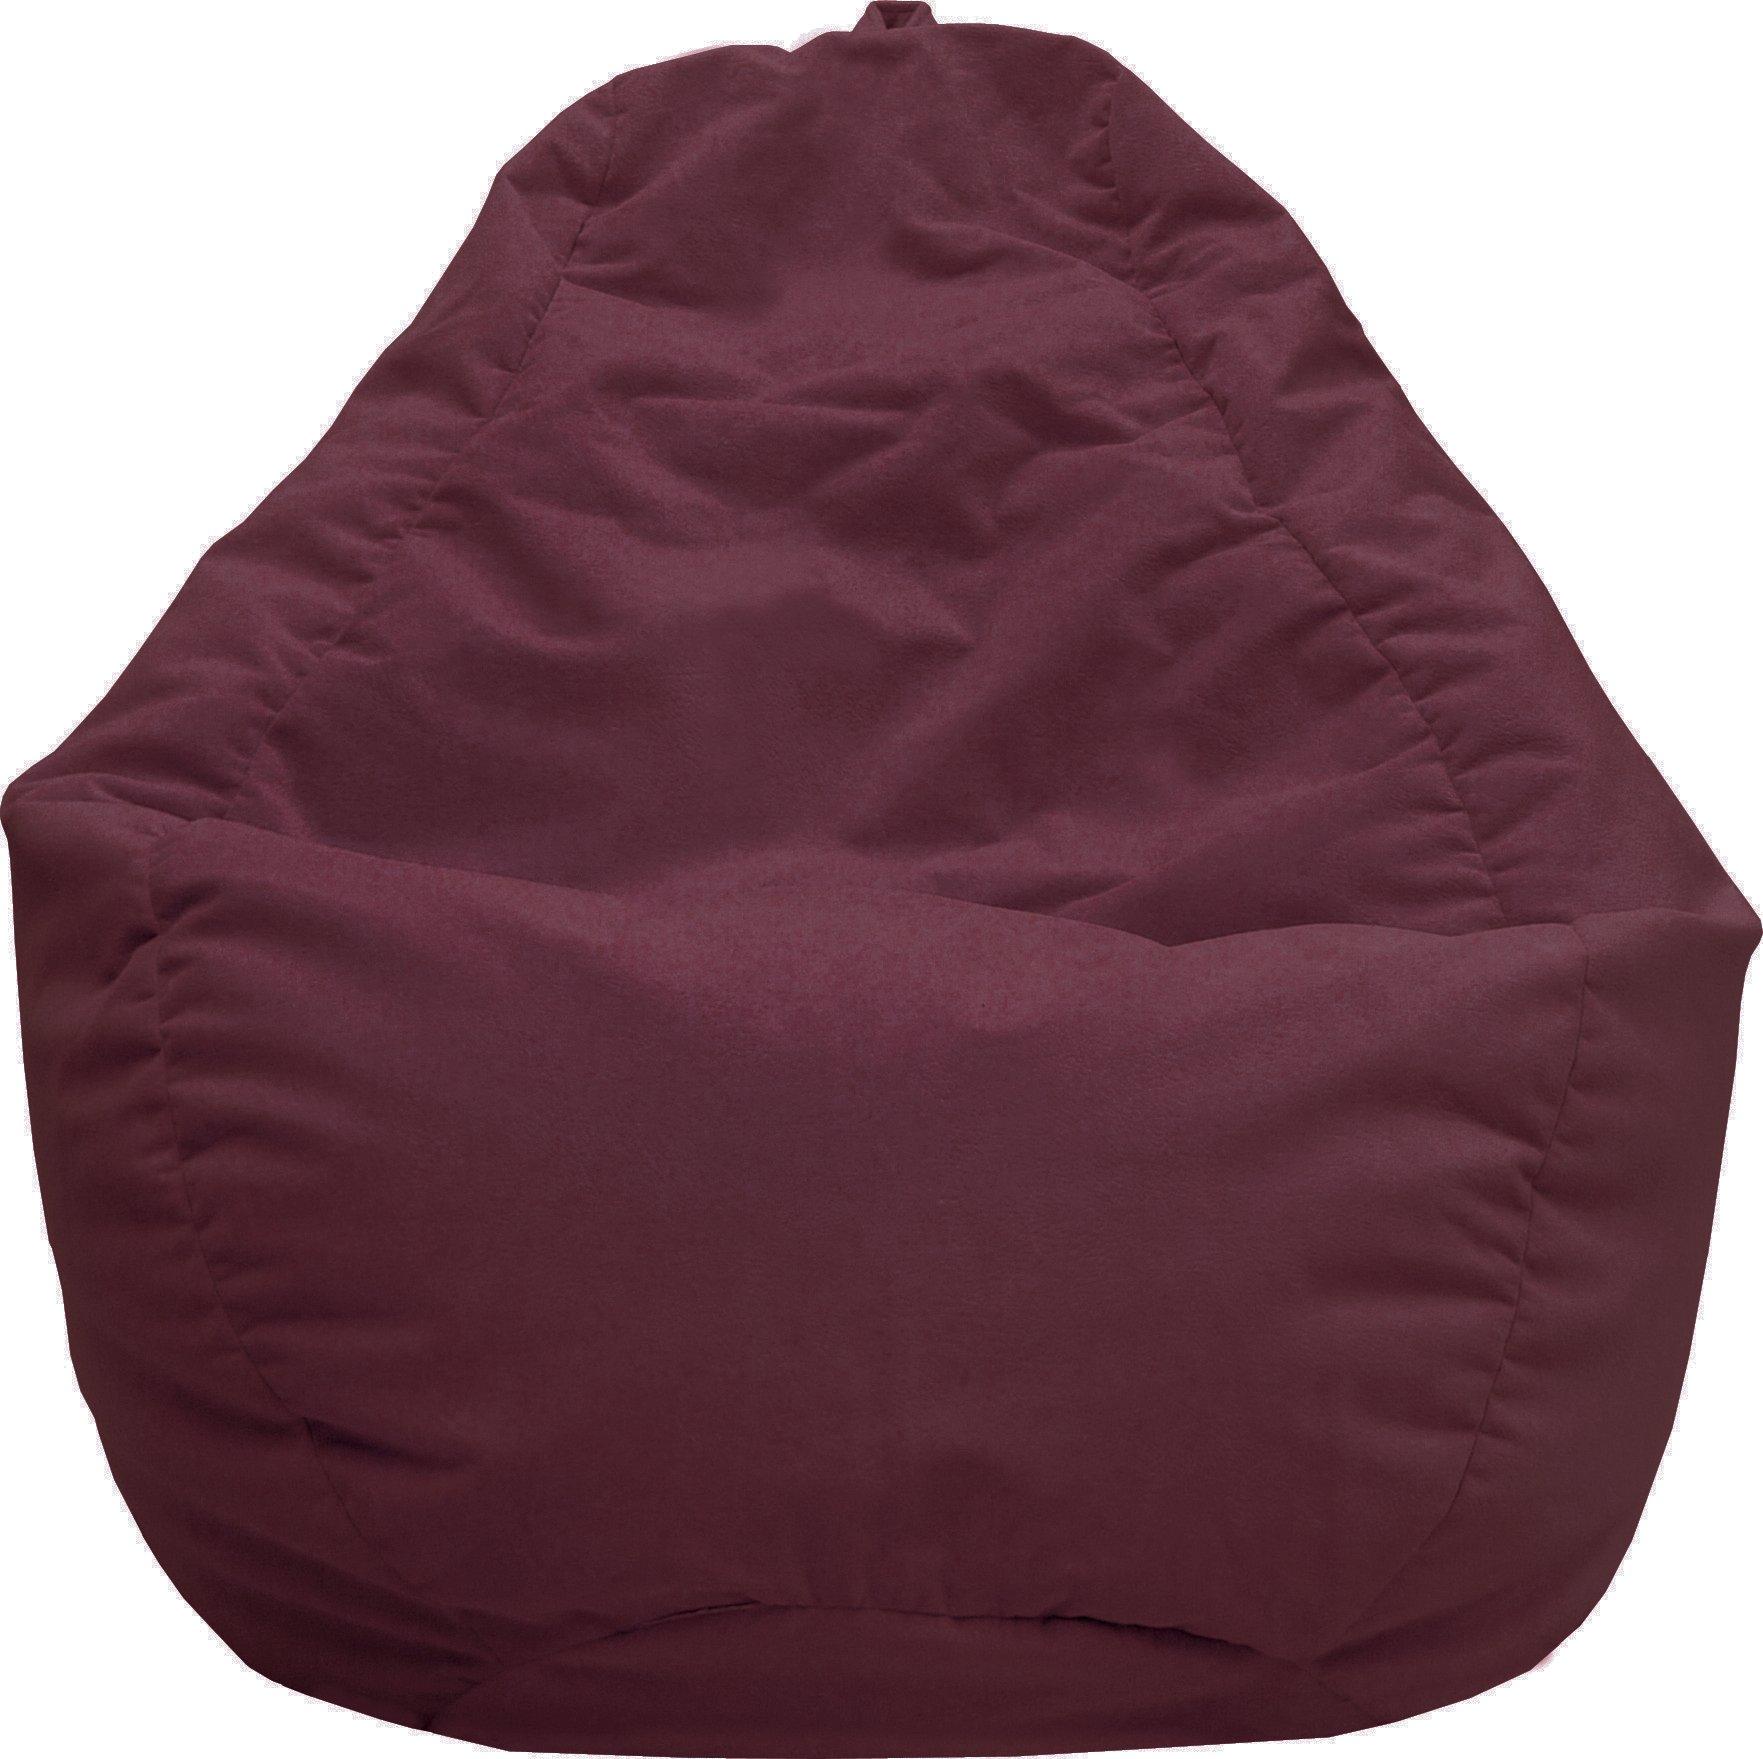 Gold Medal Bean Bags 30011258847TD Large Fairview Suede Tear Drop Bean Bag, Wine